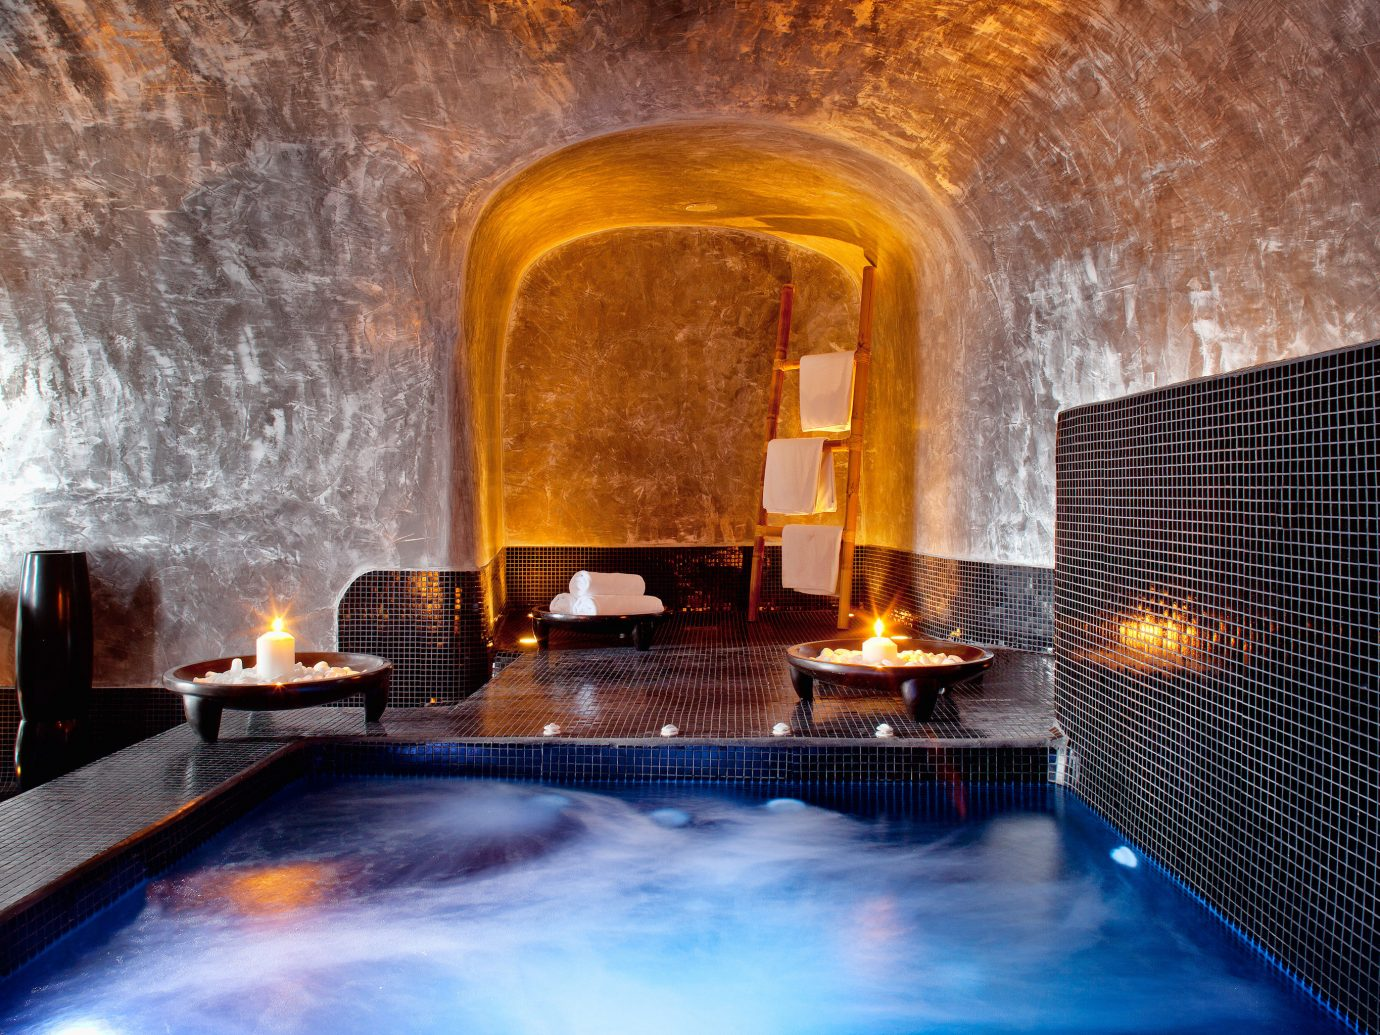 Beach Beachfront Greece Hotels Lounge Luxury Modern Ocean Pool Santorini indoor stone thermae swimming pool cooking